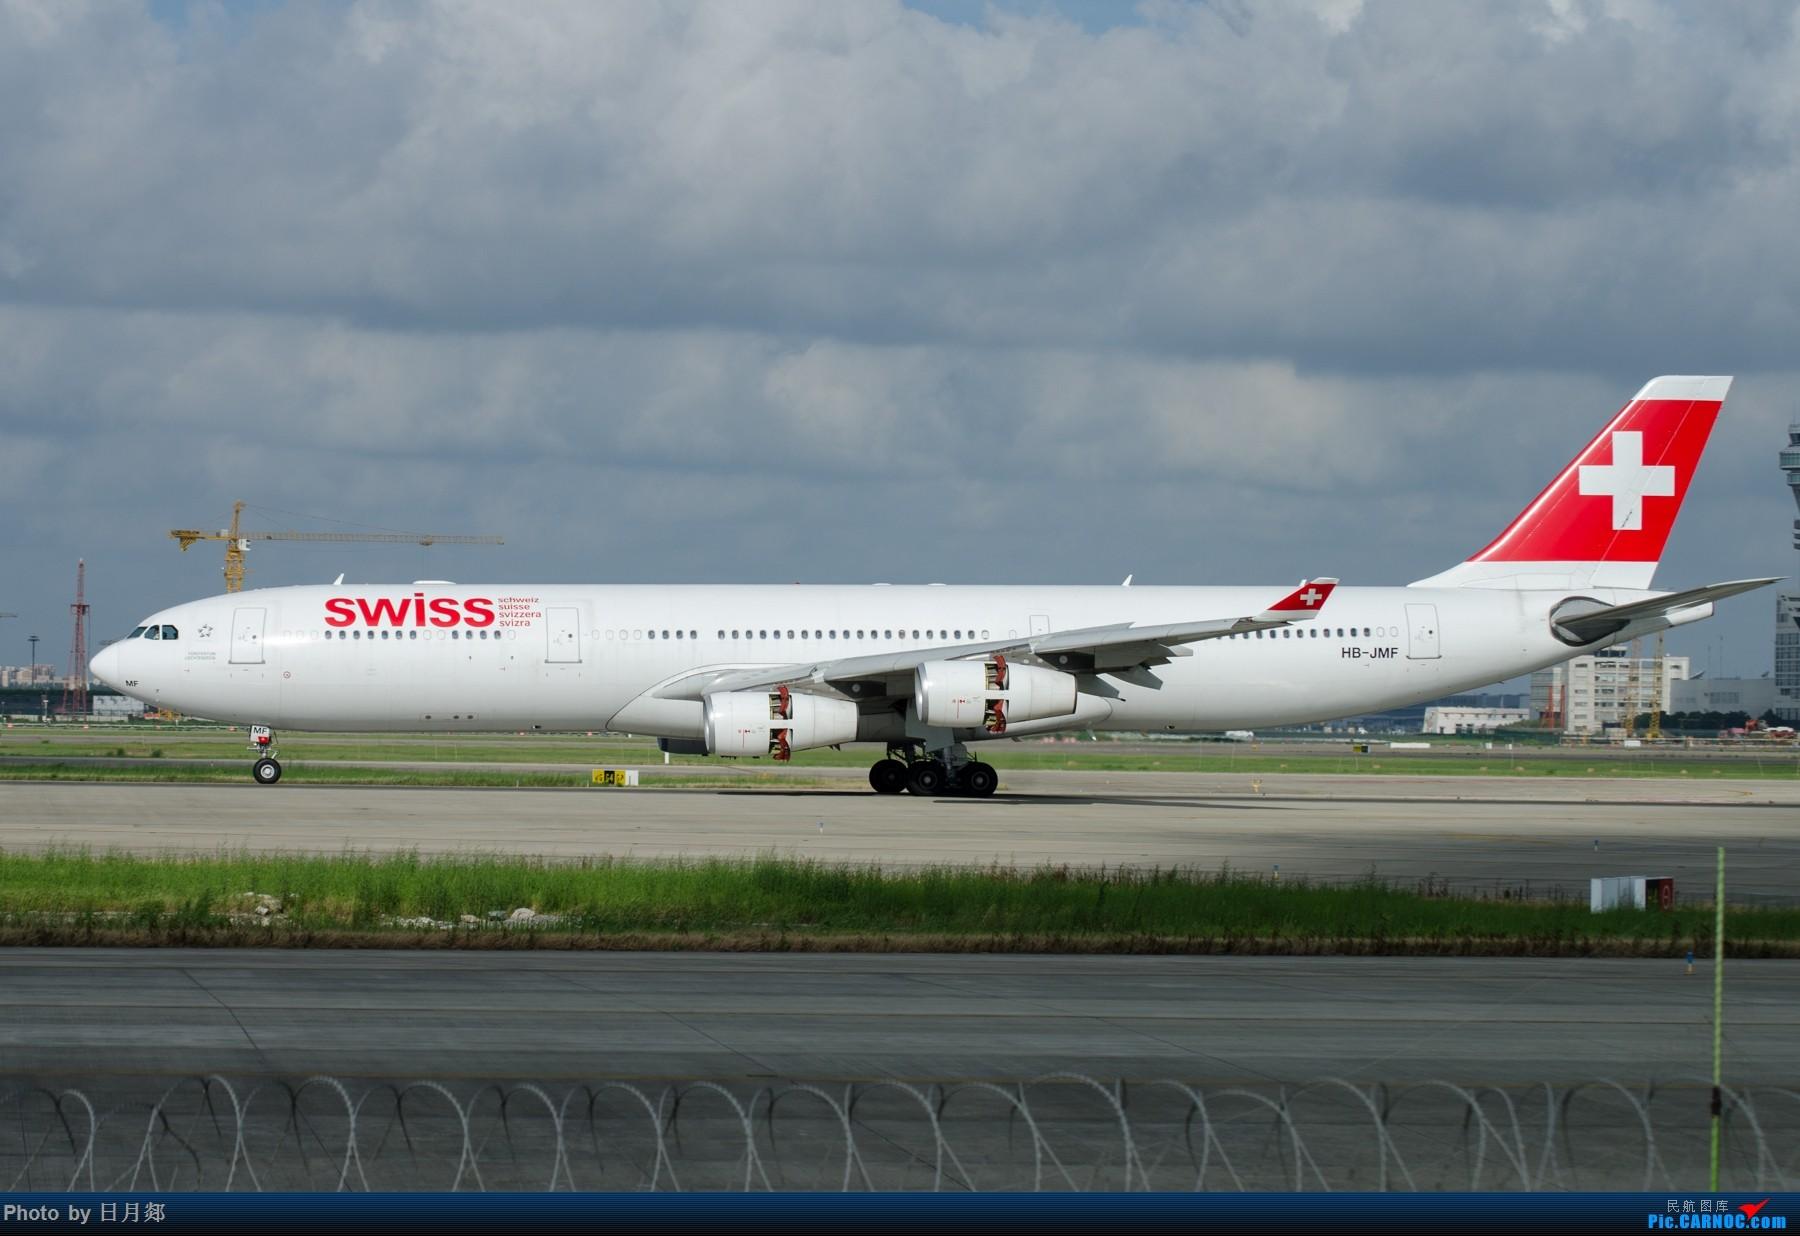 Re:[原创]一年起的最早的一次,PVG撒欢! AIRBUS A340-300 HB-JMF 中国上海浦东国际机场